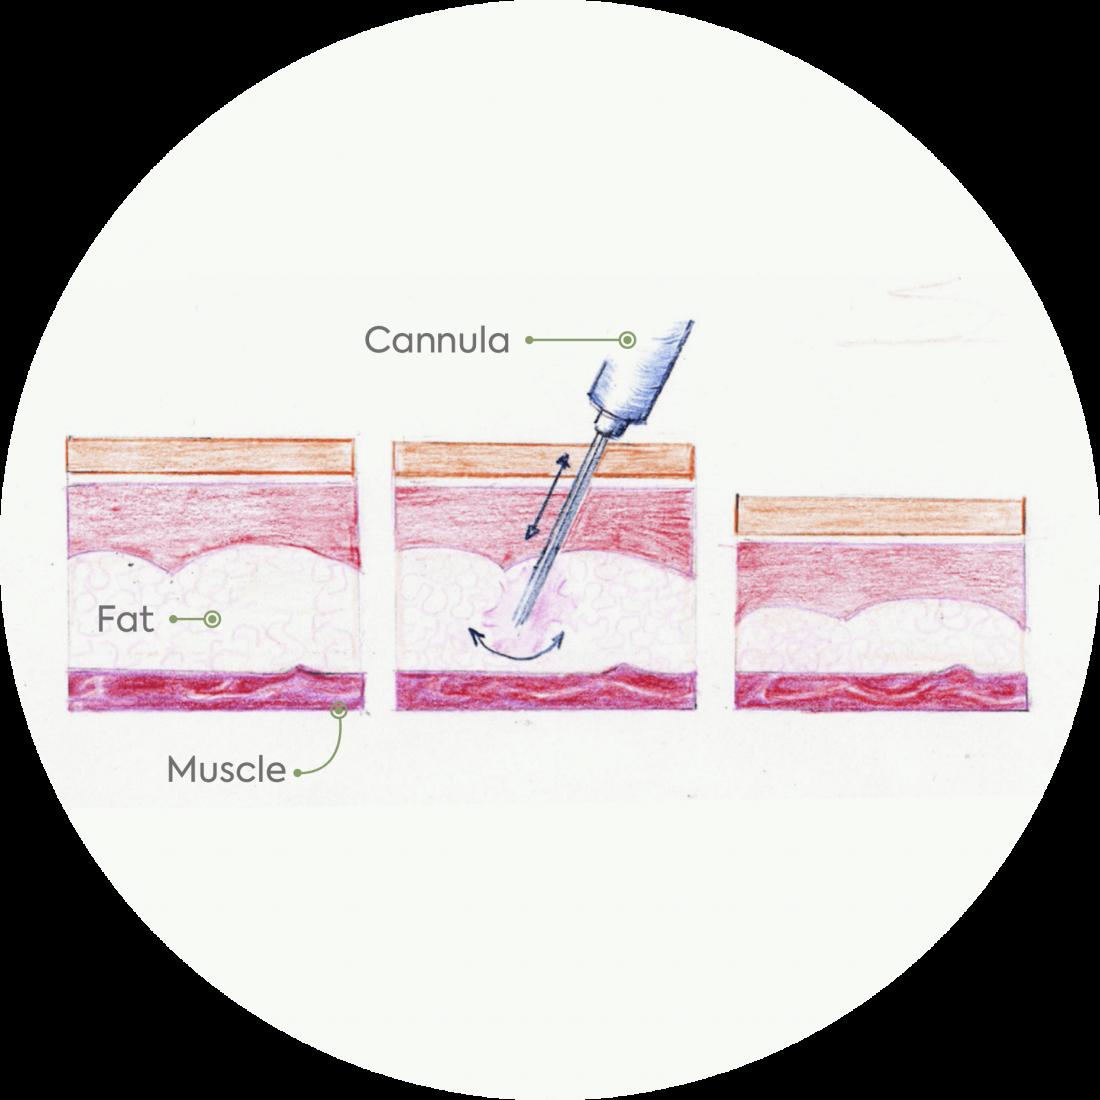 Procedure details: Vaser Liposuction